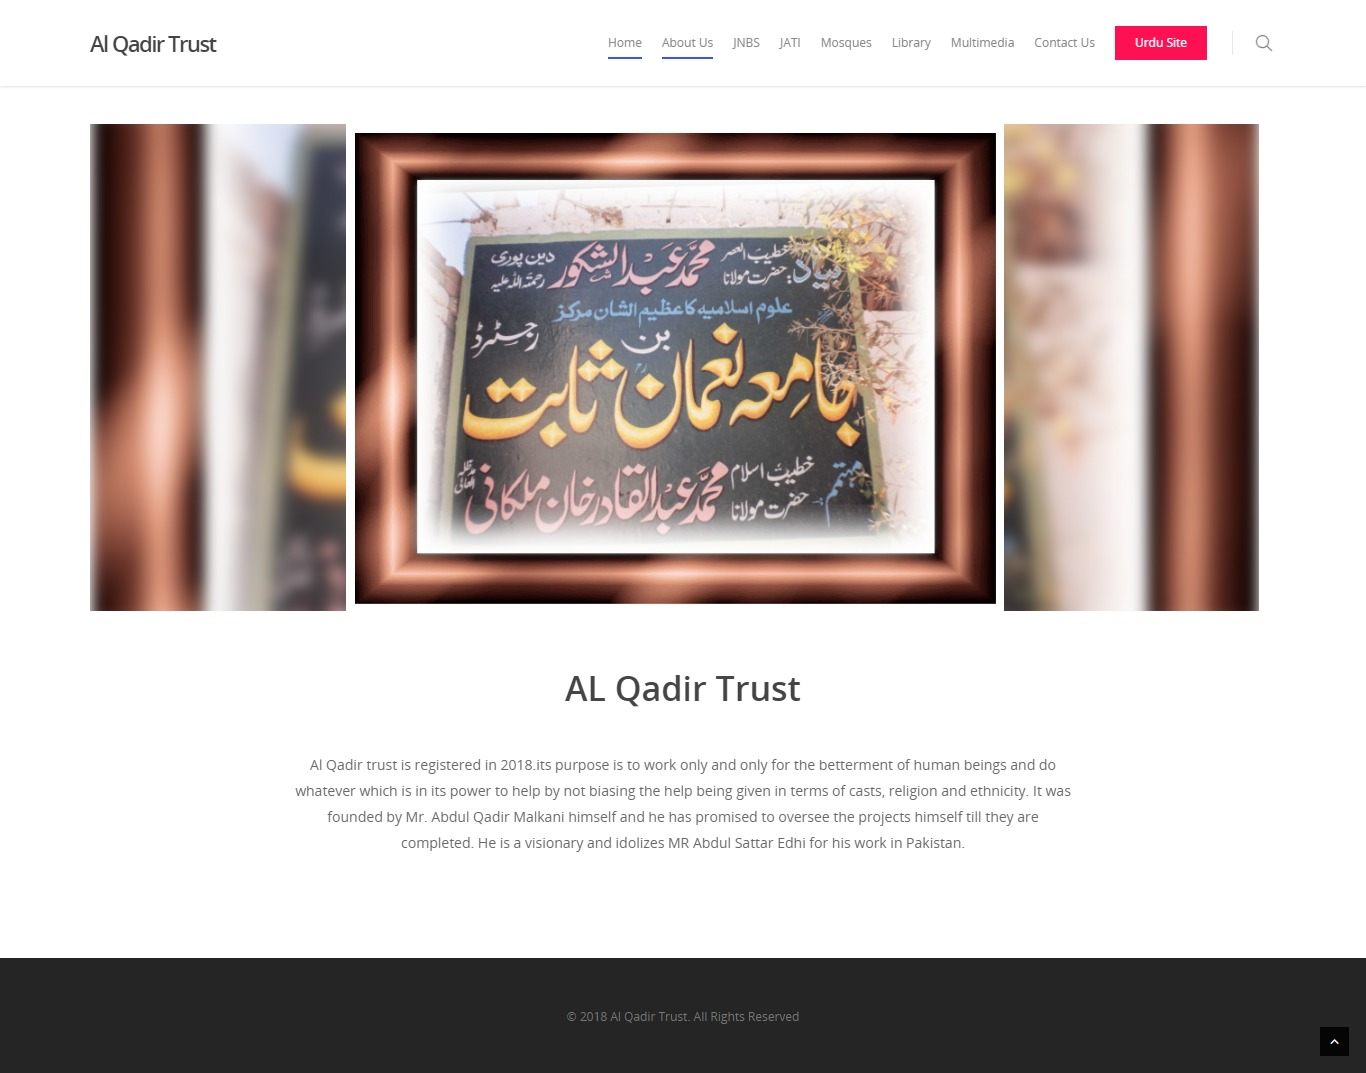 httpalqadirtrust.pk